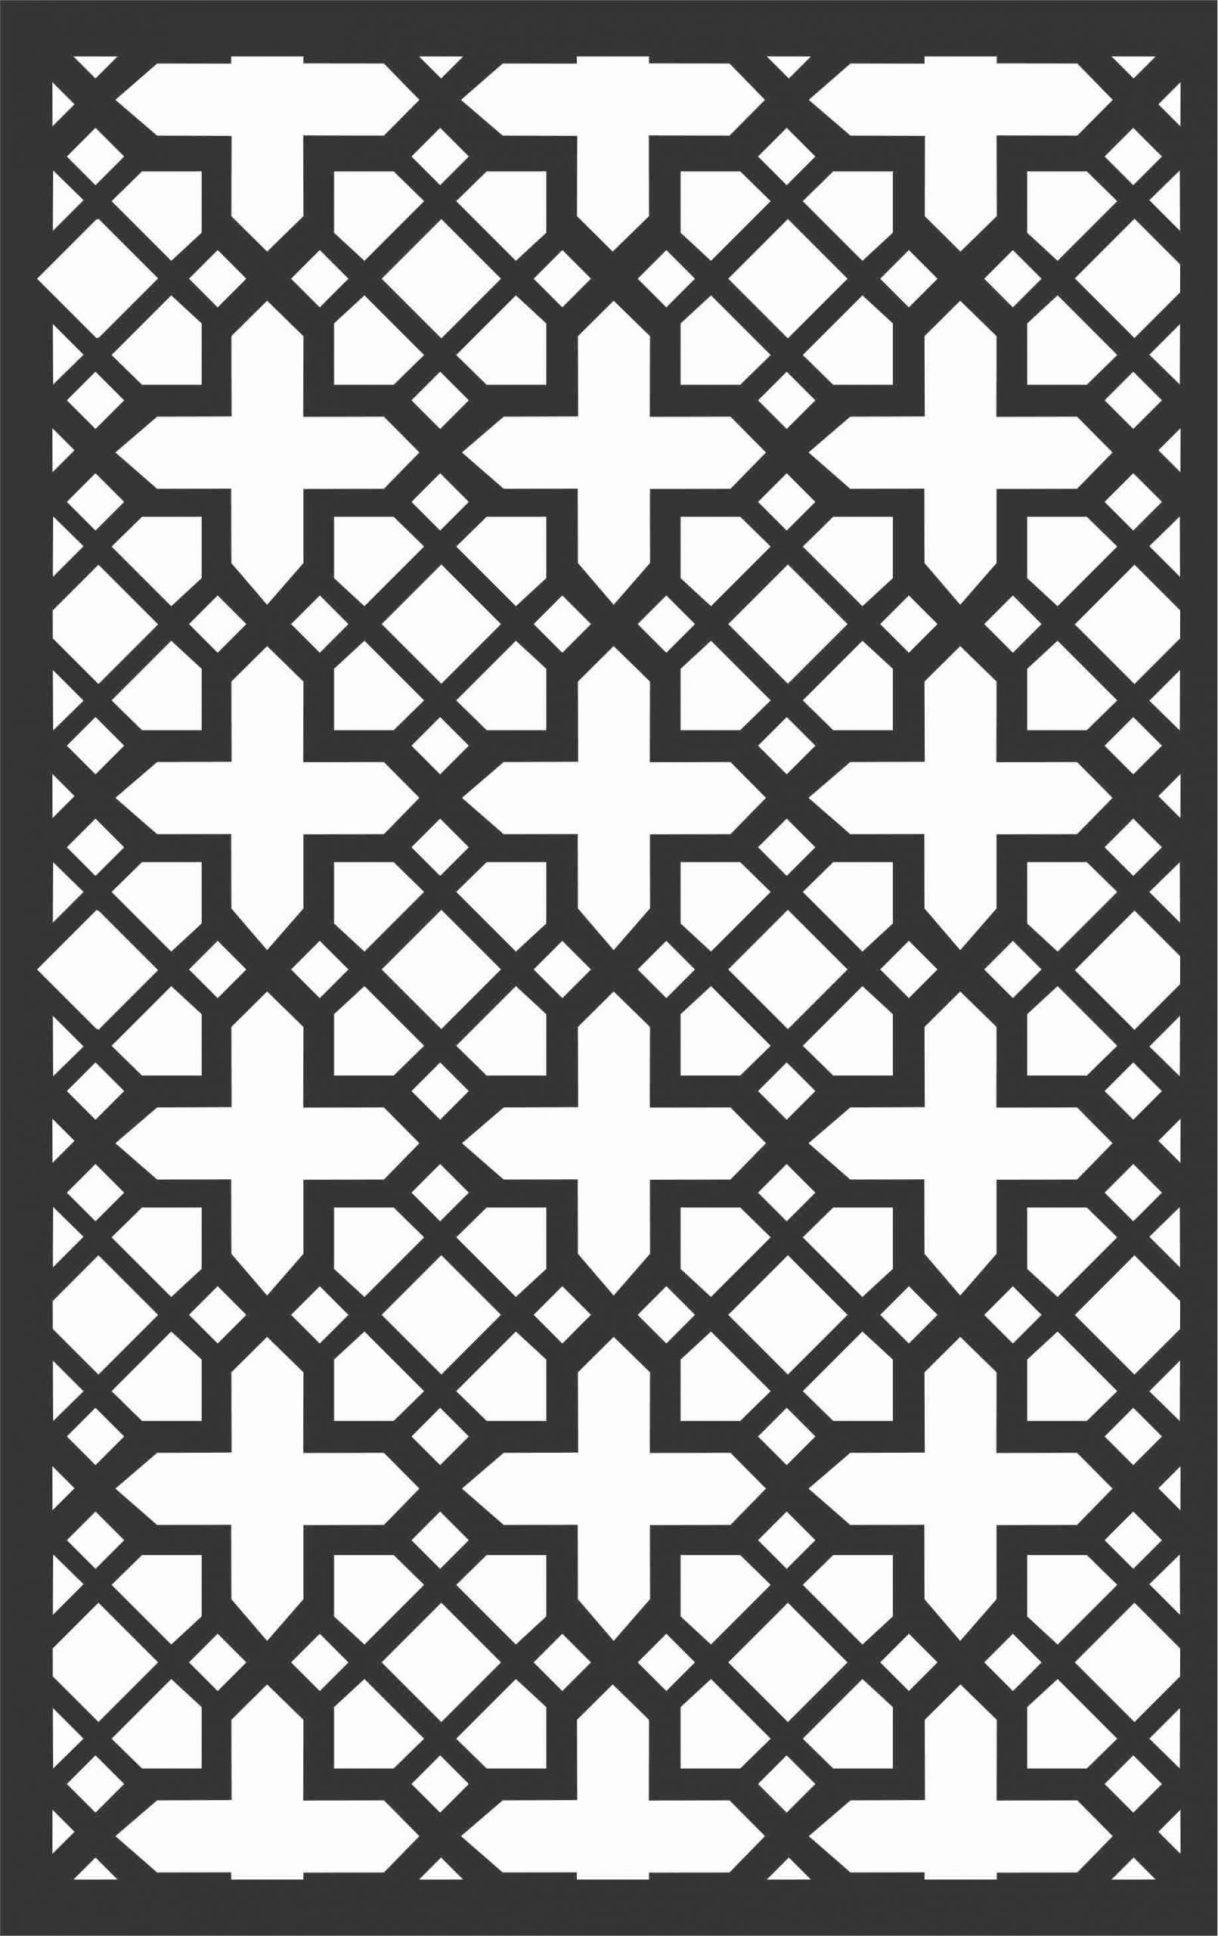 Screen Panel Patterns Seamless 31 Free DXF File